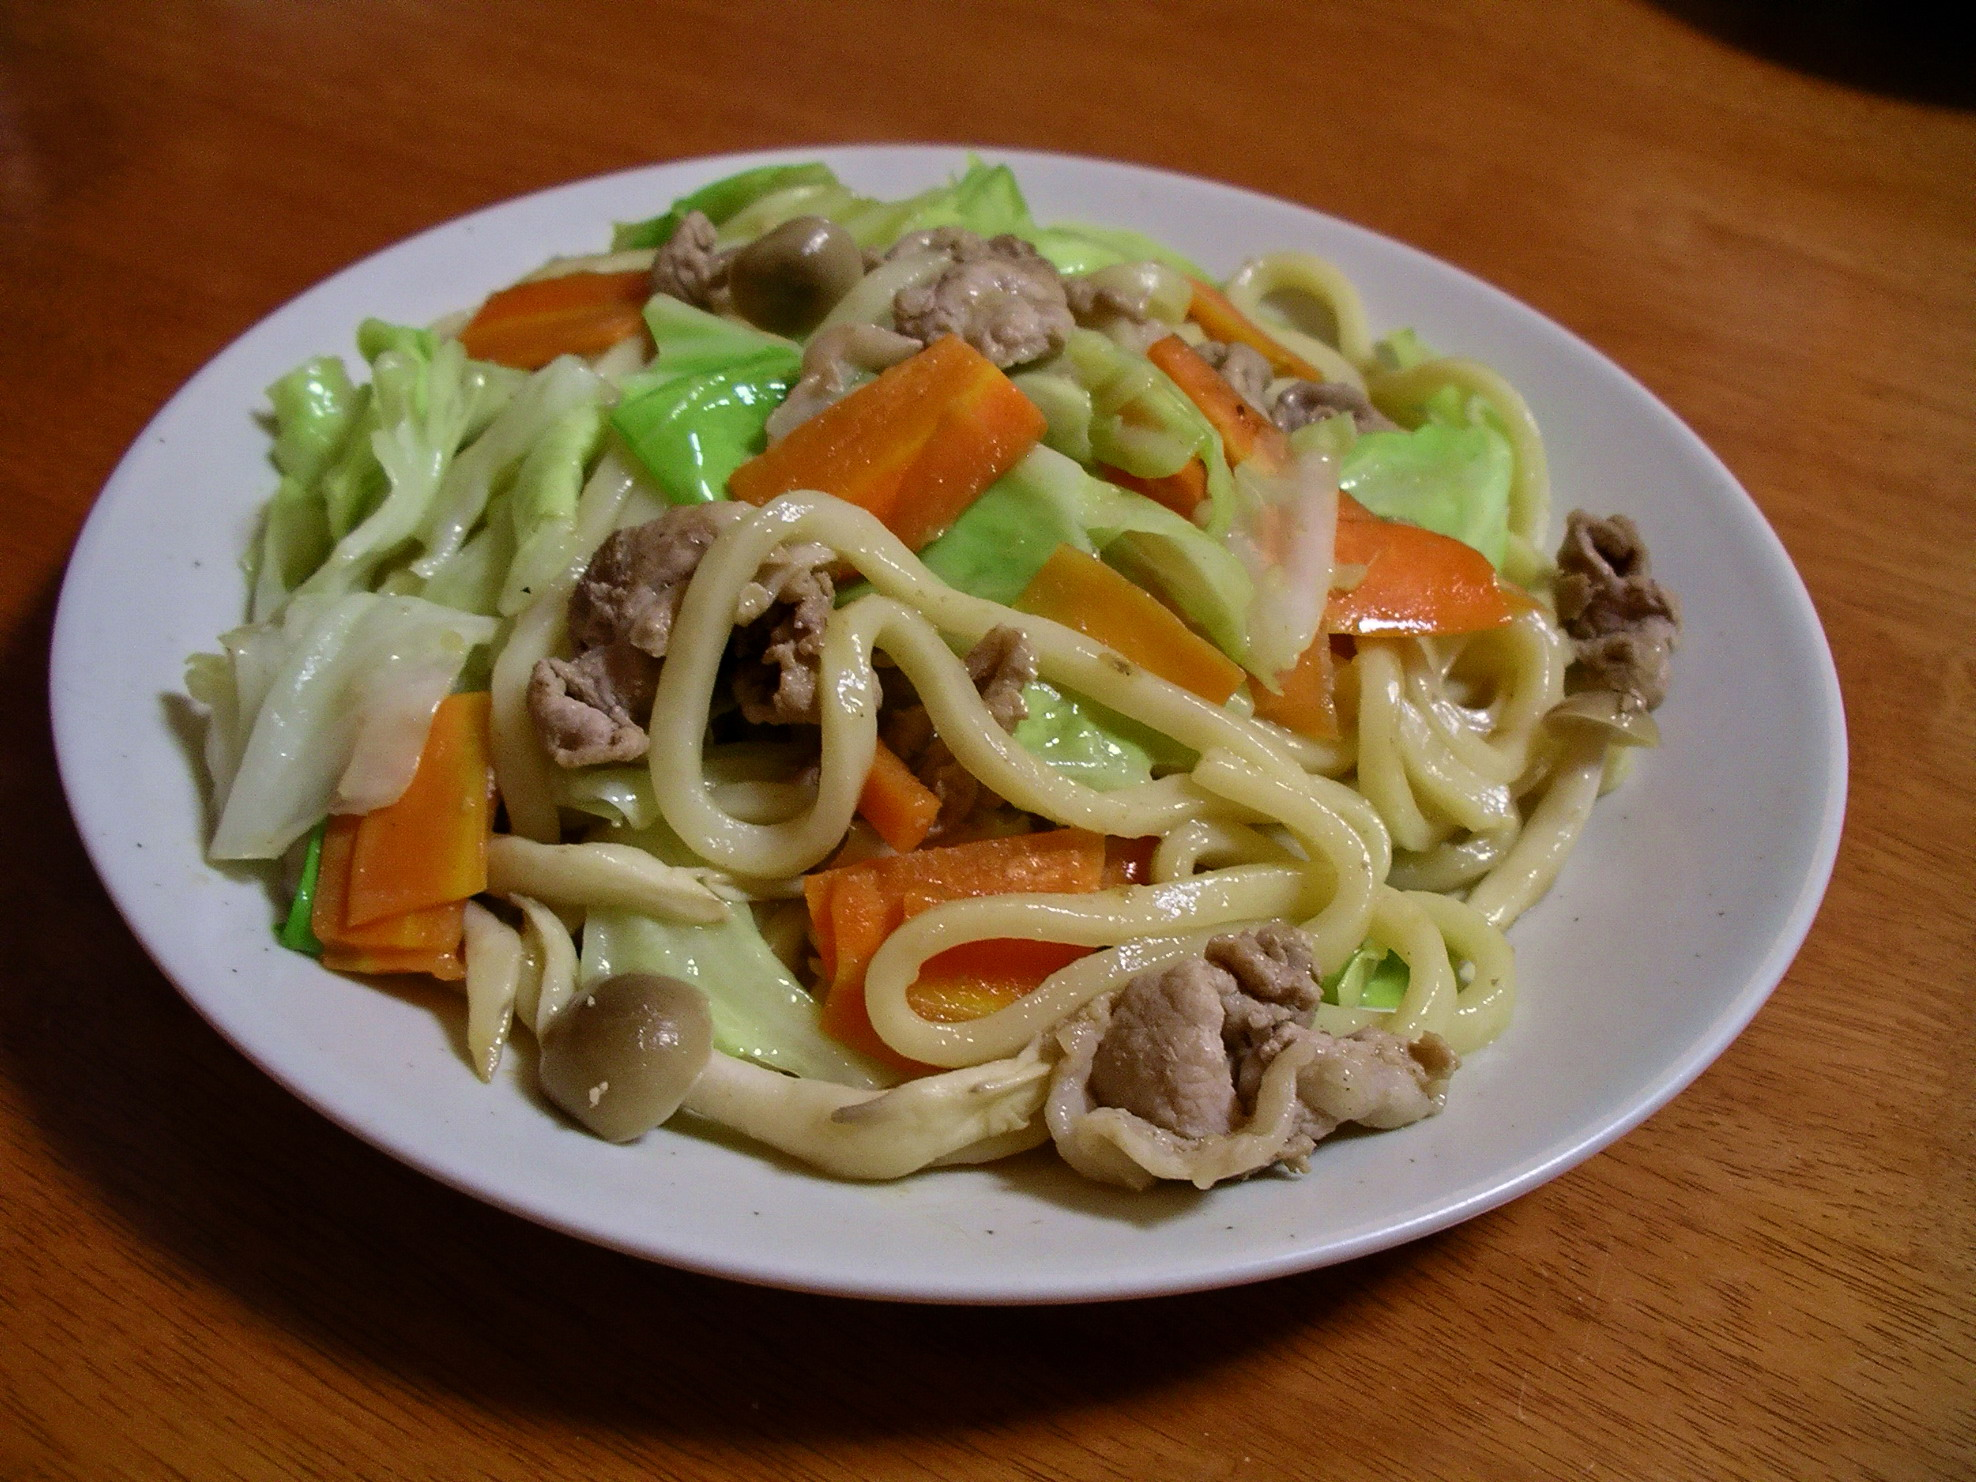 udon yaki udon yaki udon noodles yaki udon the udon noodles were stir ...